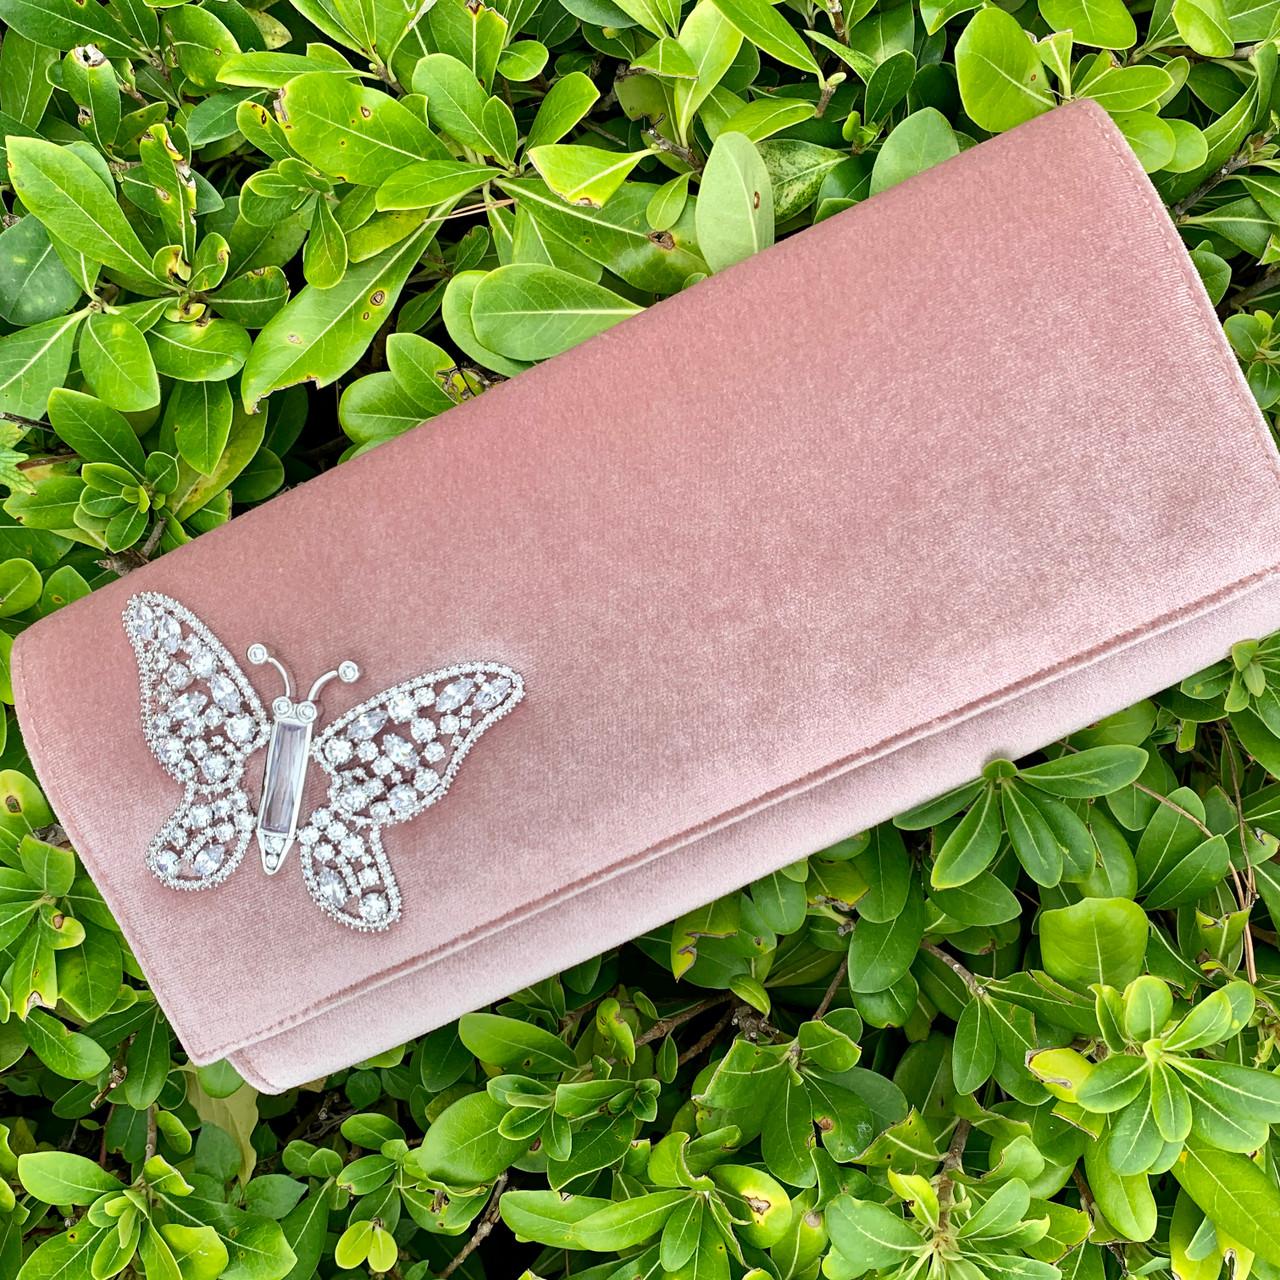 Farfalla Blush Velvet Clutch Bag